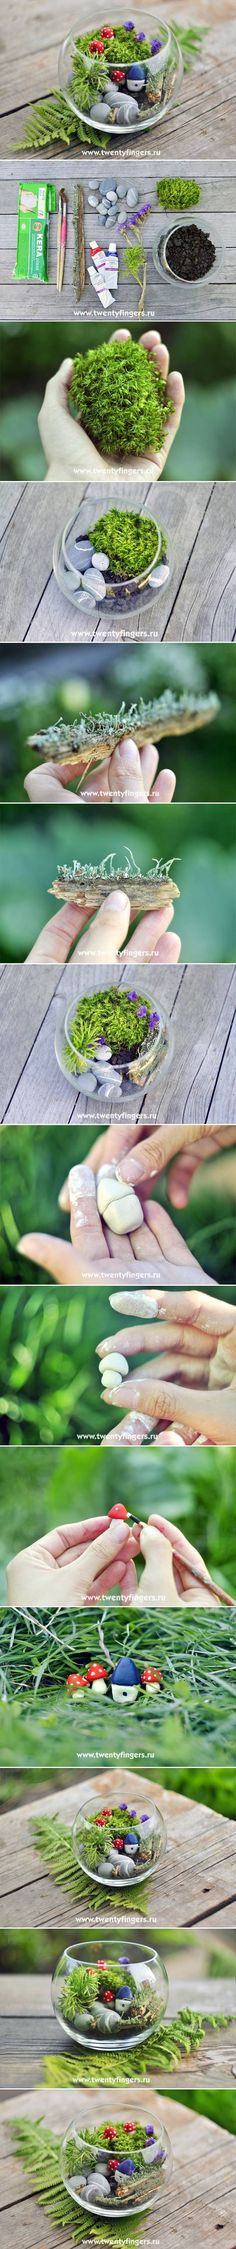 DIY Small Evergreen